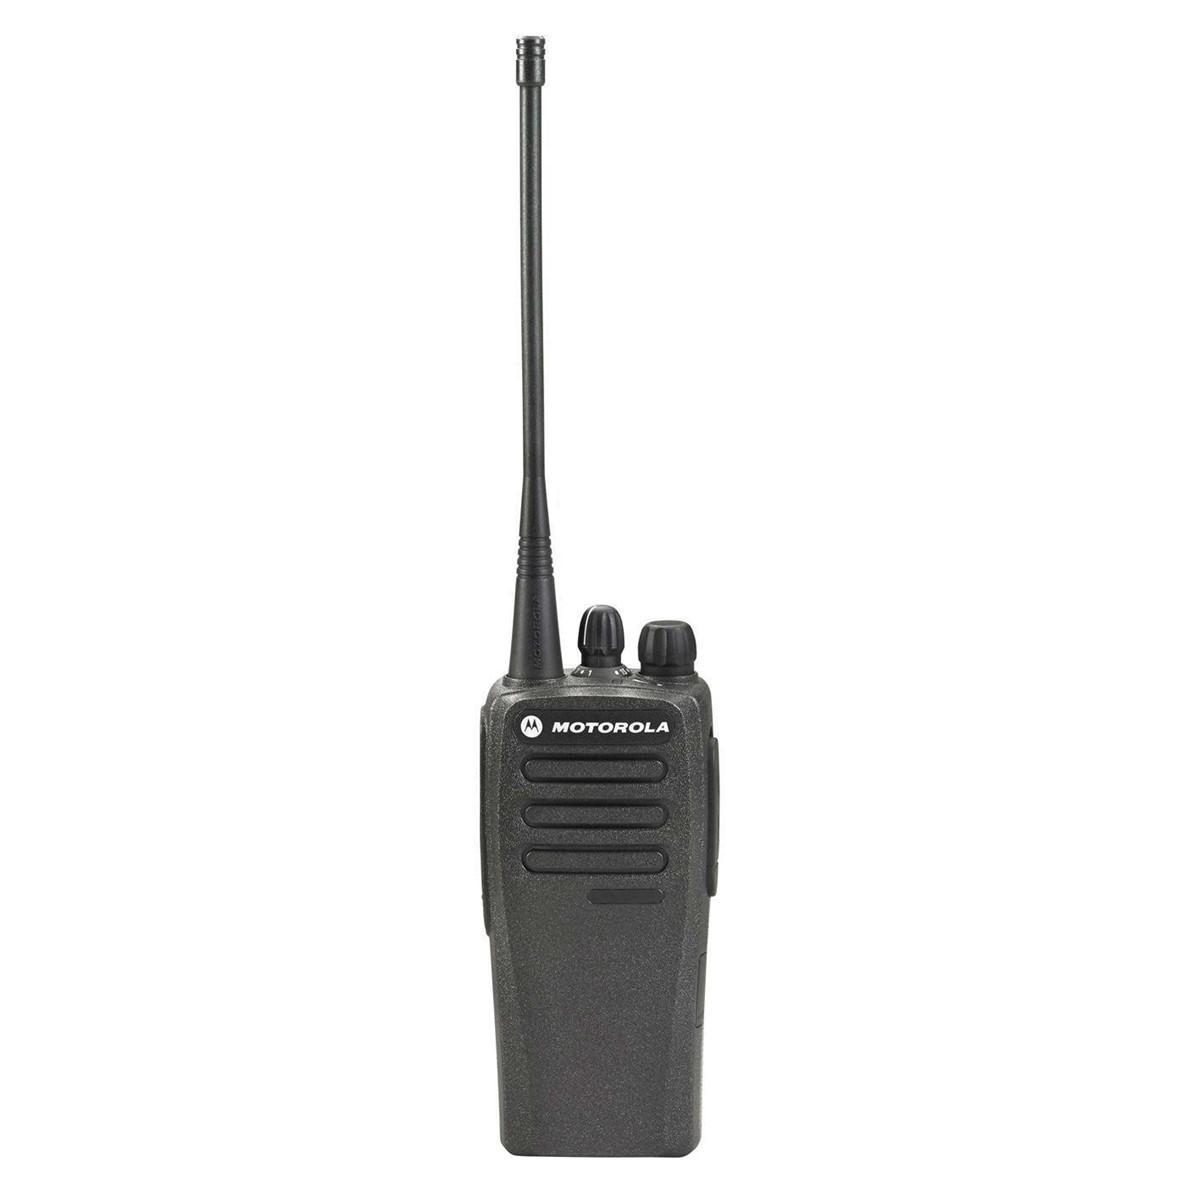 Radio Motorola DEP450 Analógico LAH01QDC9JC2AN UHF 403-470 MHz